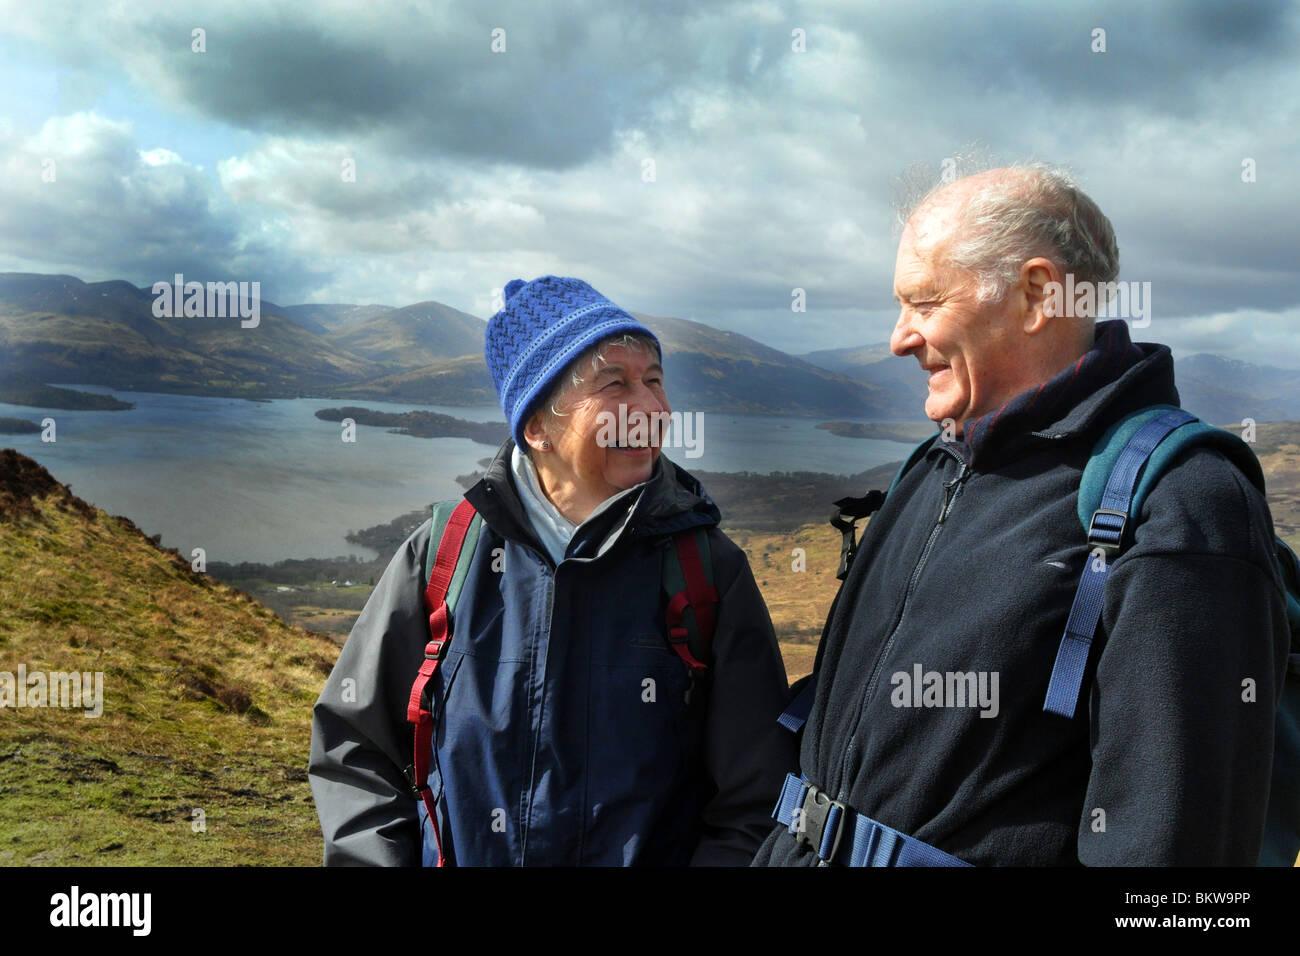 Aktive ältere Menschen gehen Bergwandern in the Trossachs National Park, Schottland Stockfoto